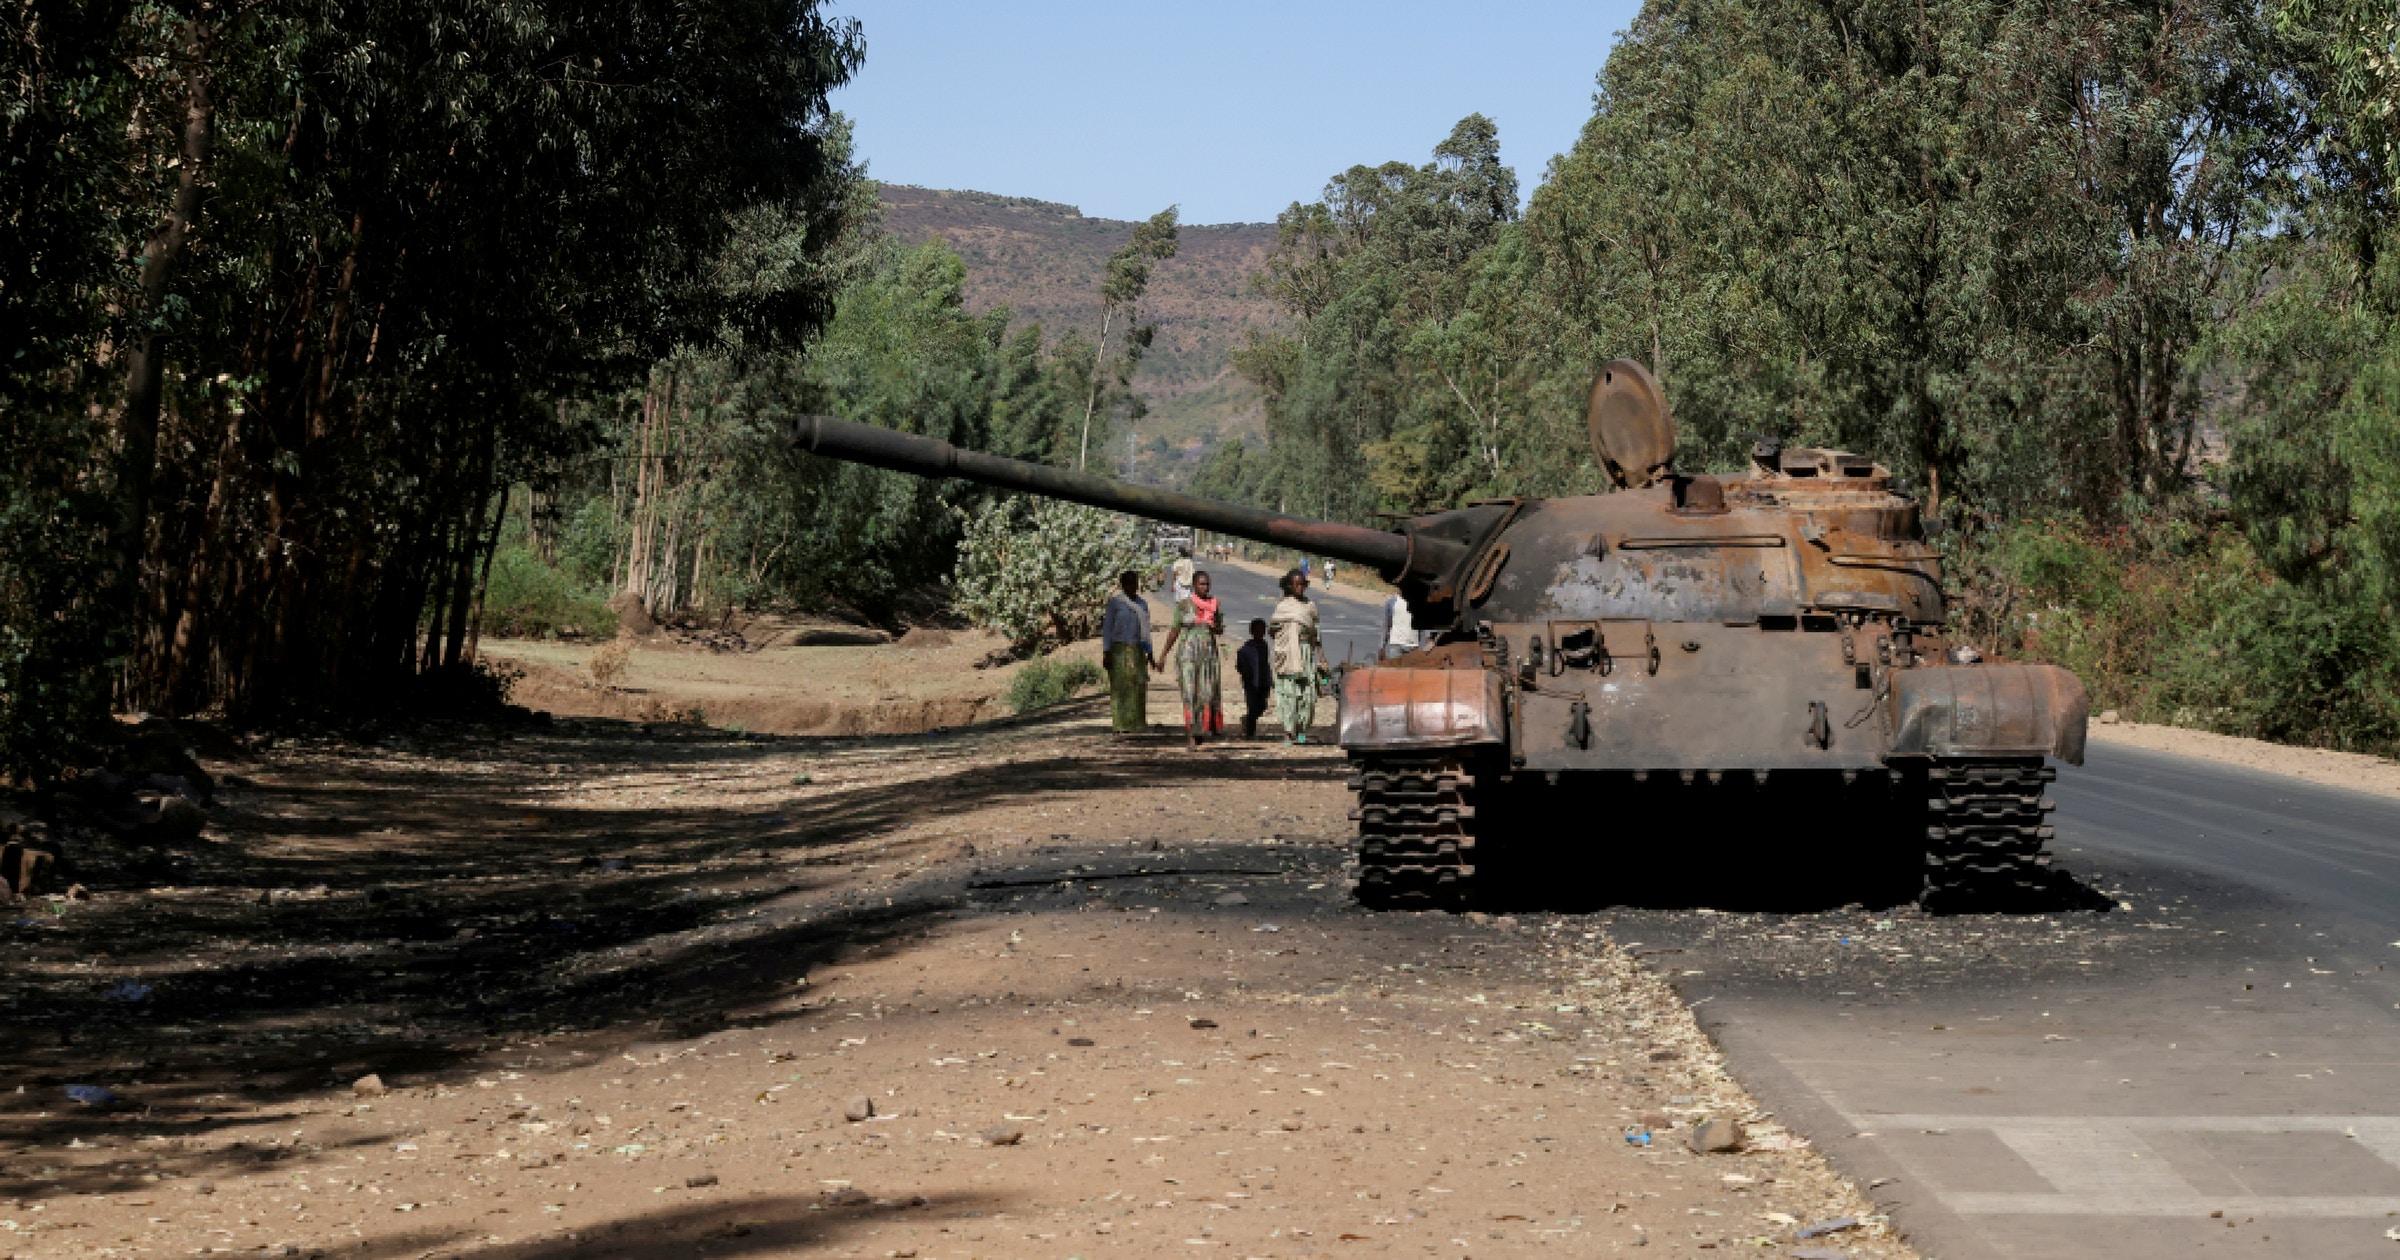 Qatar Welcomes Ceasefire in Tigray Region of Ethiopia